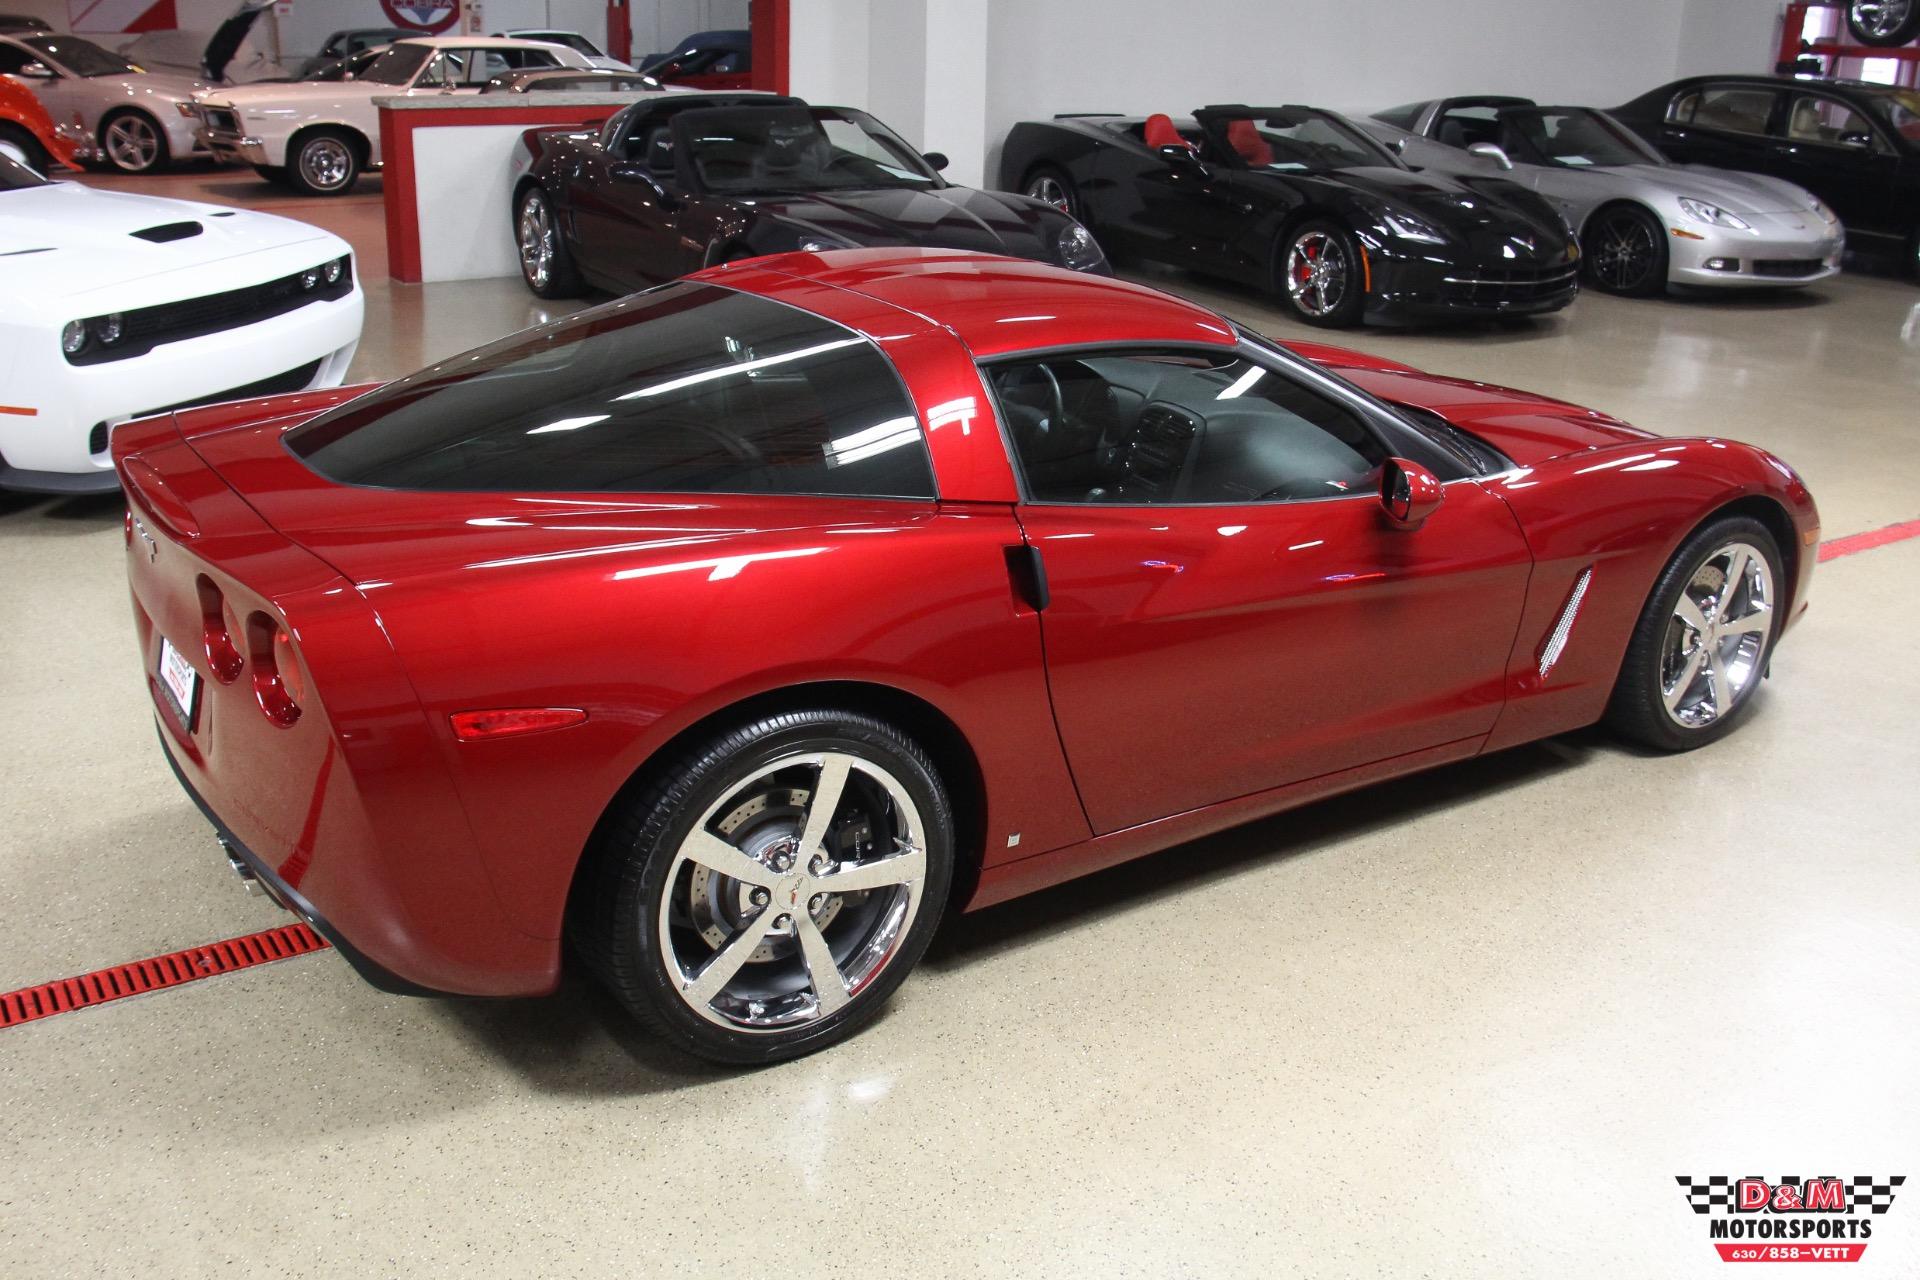 Used 2008 Chevrolet Corvette Coupe | Glen Ellyn, IL